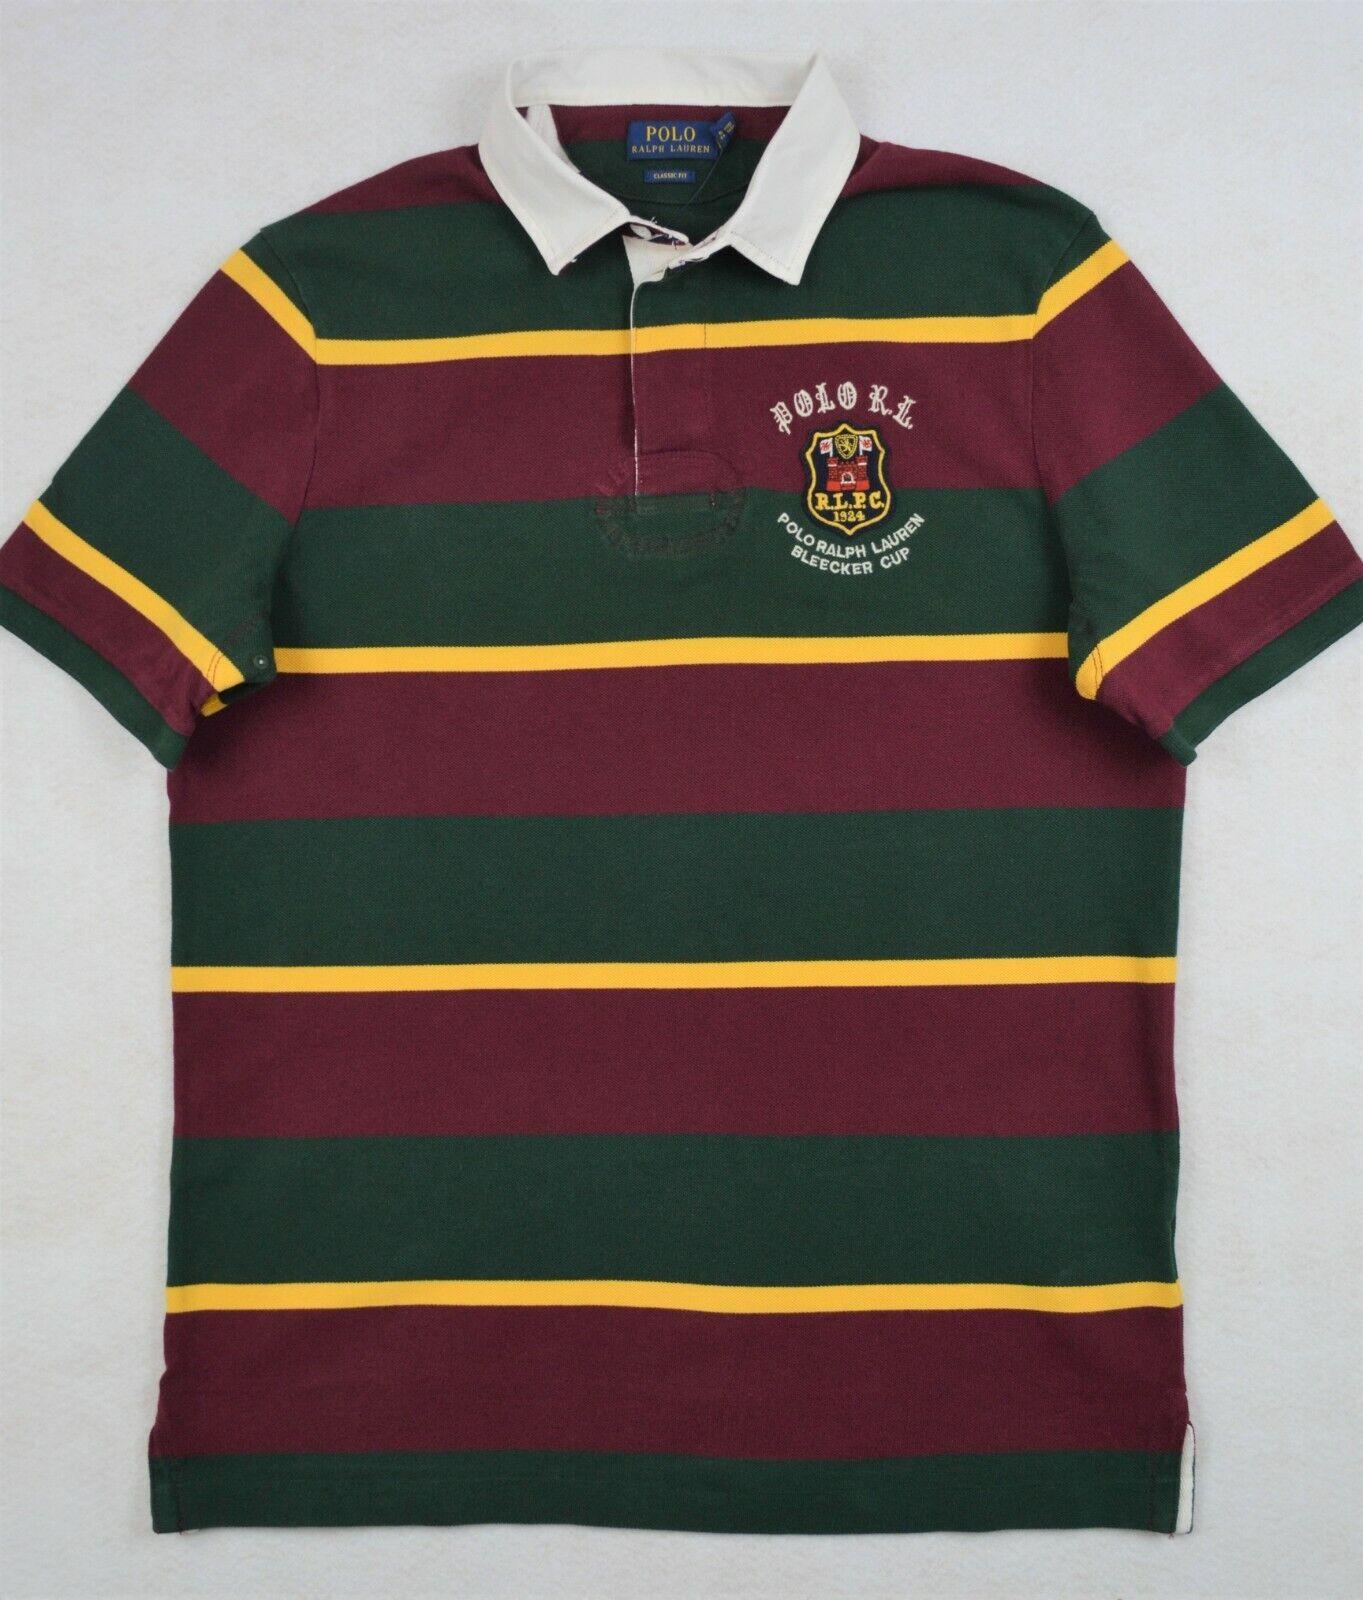 Polo Ralph Lauren Rugby Crest Mesh Stripe Shirt S & M NWT